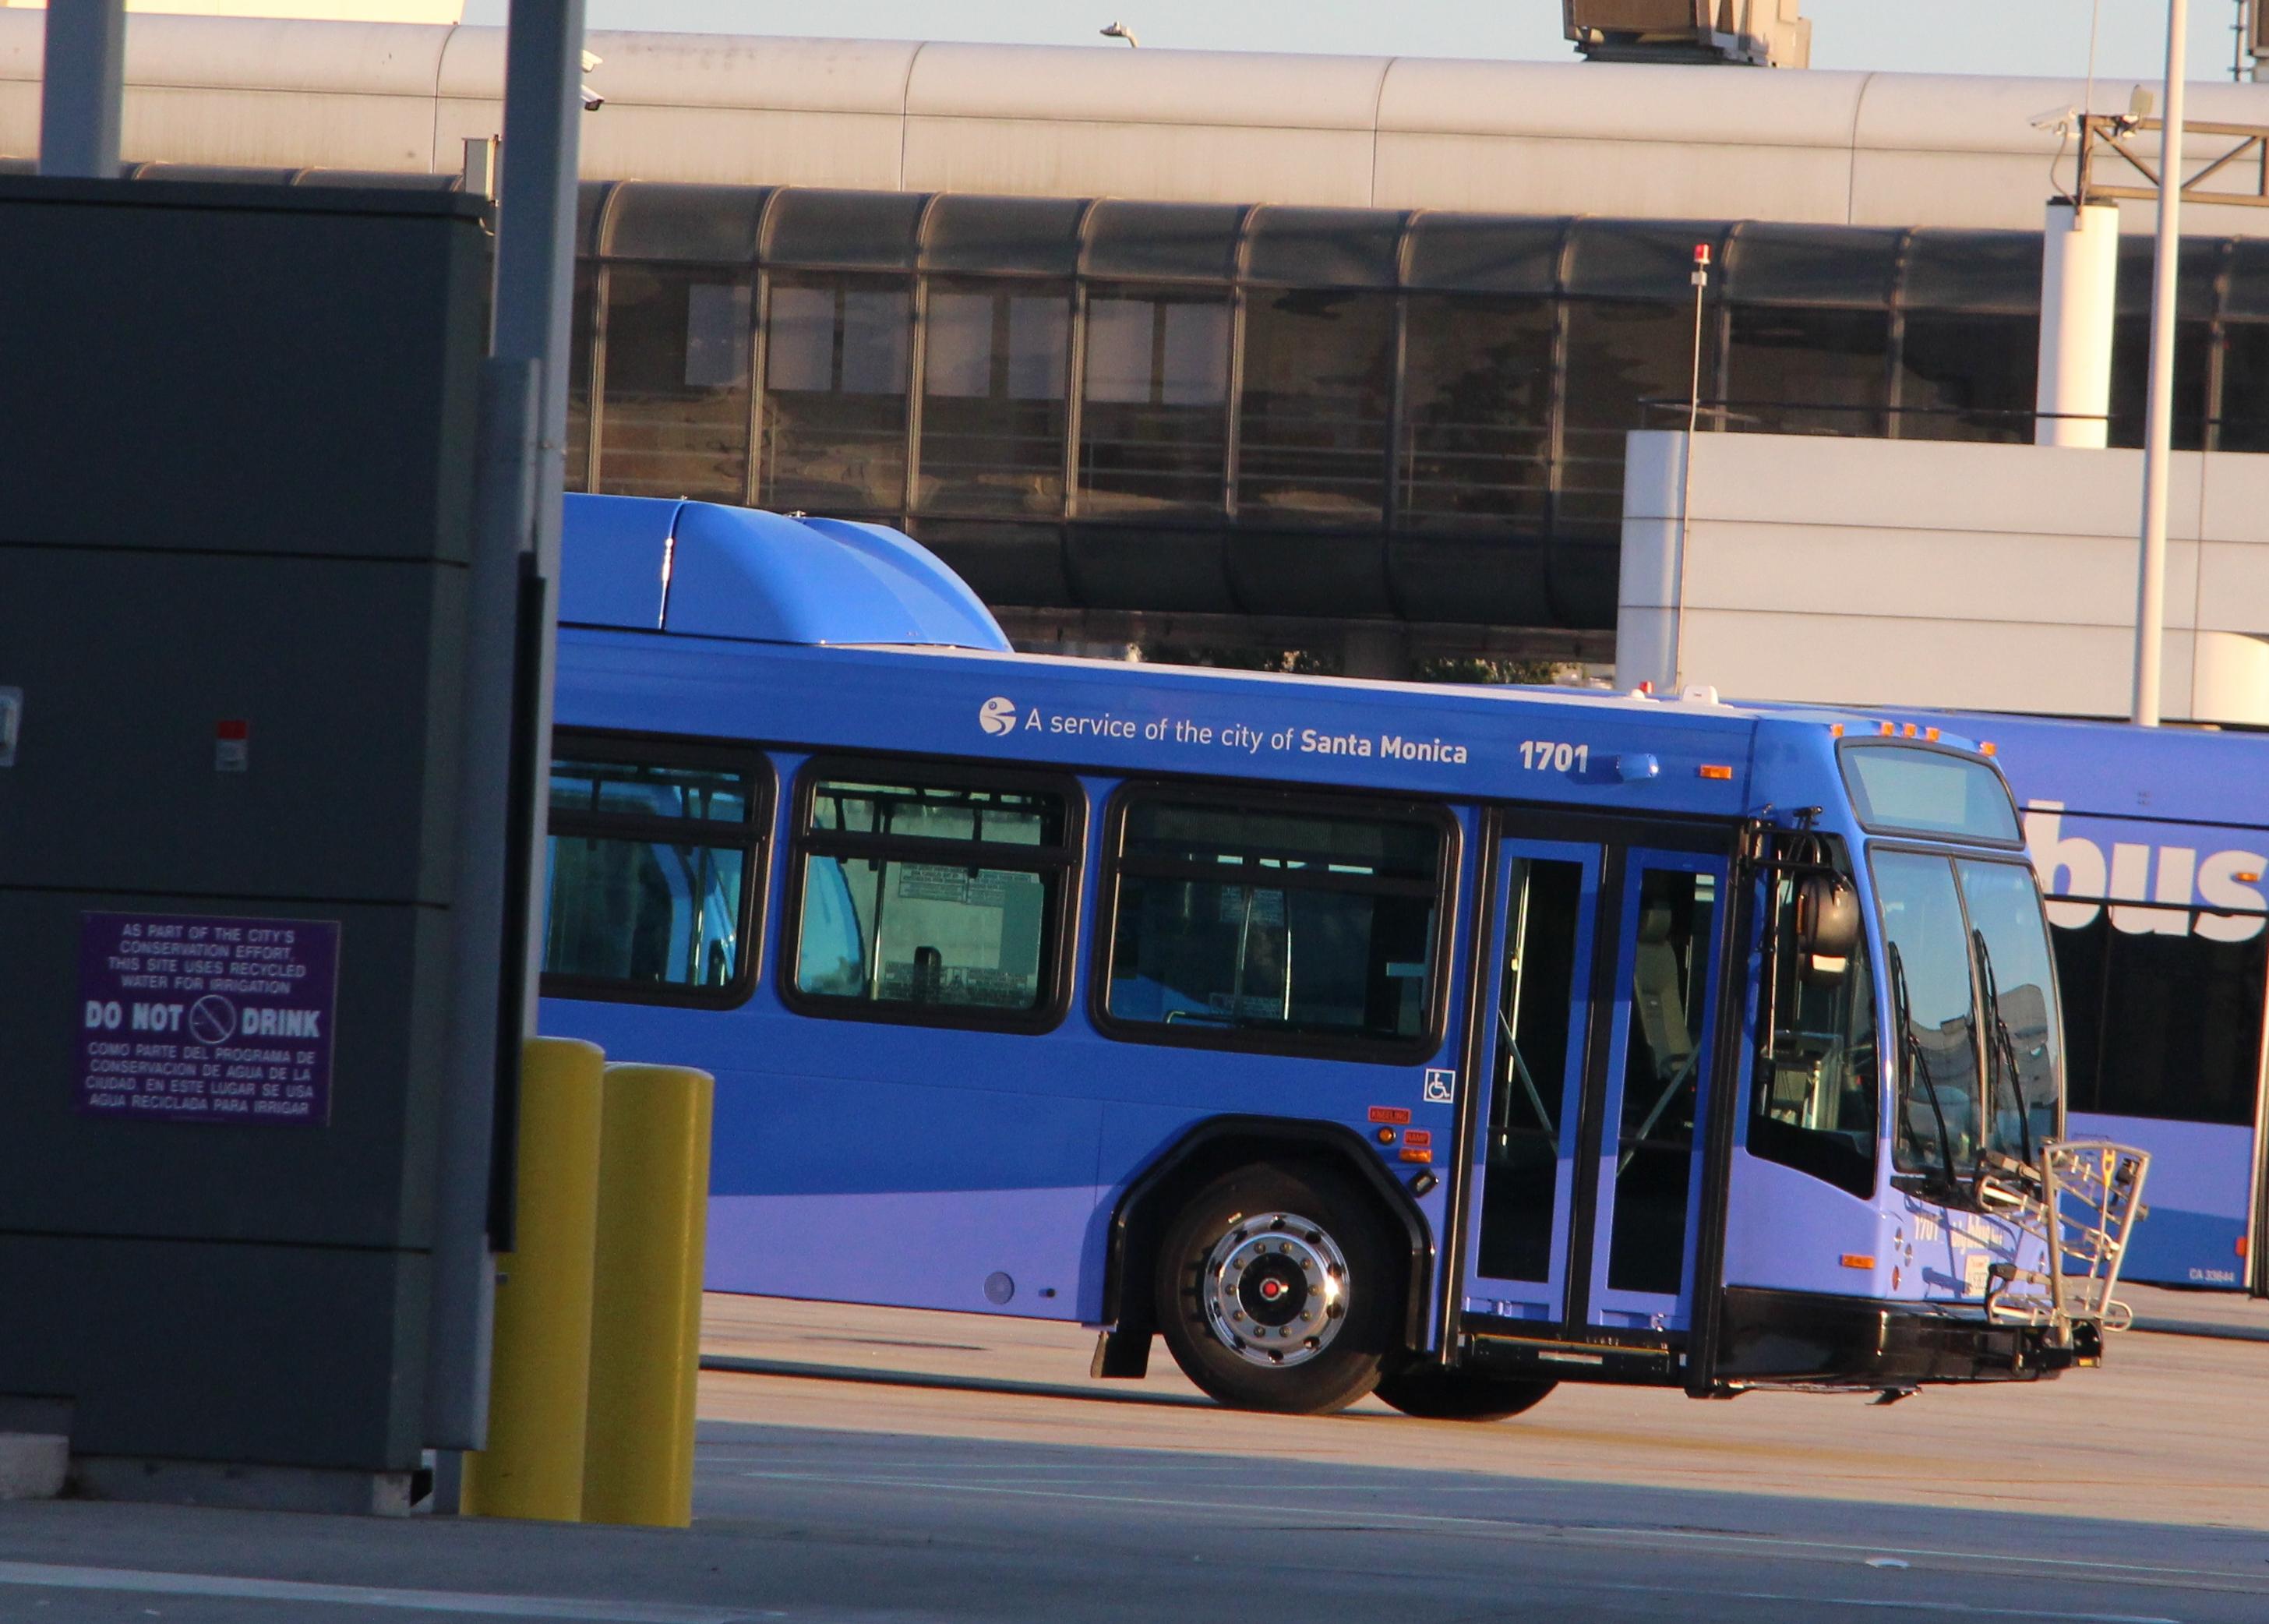 File:Big Blue Bus Gillig BRT 1701.jpg - Wikimedia Commons on culver city bus map, las vegas blue bus map, santa monica big blue buses, culver city google map, big blue bus map, santa monica bus 14, santa monica bus lines map,